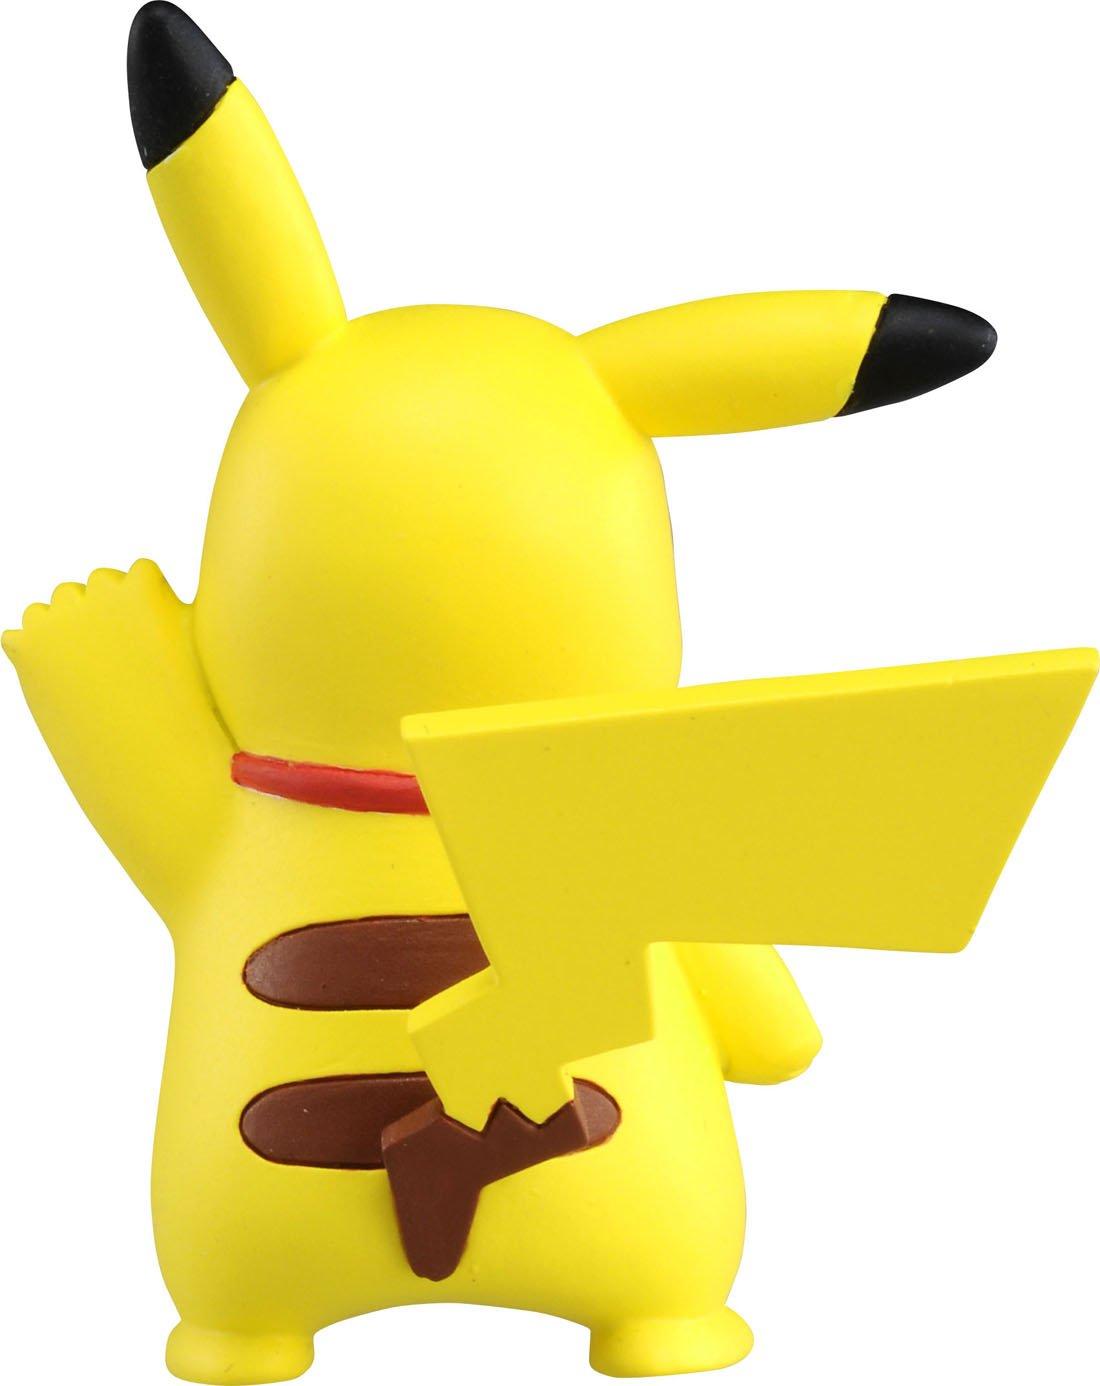 Takara Tomy EMC-07 Pokemon Sun /& Moon Pikachu Ultra Guardians Figure 2 2 Takaratomy